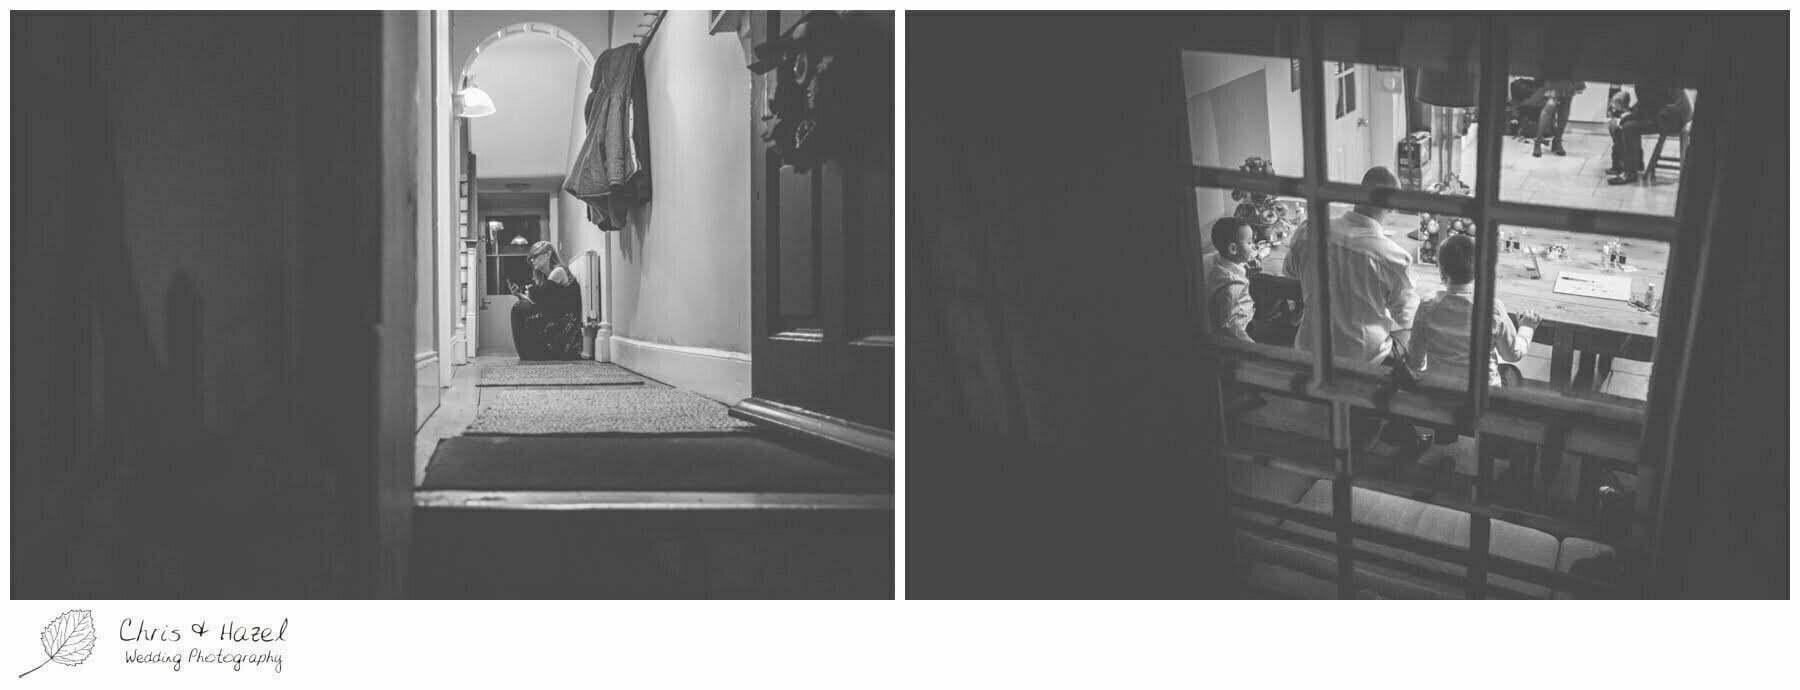 Wedding guests, The Paragon Bath, The Countess of Huntingdons Chapel, Bath Wedding Photography, Roman Baths Wedding Photographer, Wedding in Bath, Bath Wedding Day, documentary wedding photography, Chris and Hazel Wedding Photography Bath, Sammie Singfield Scott Brown